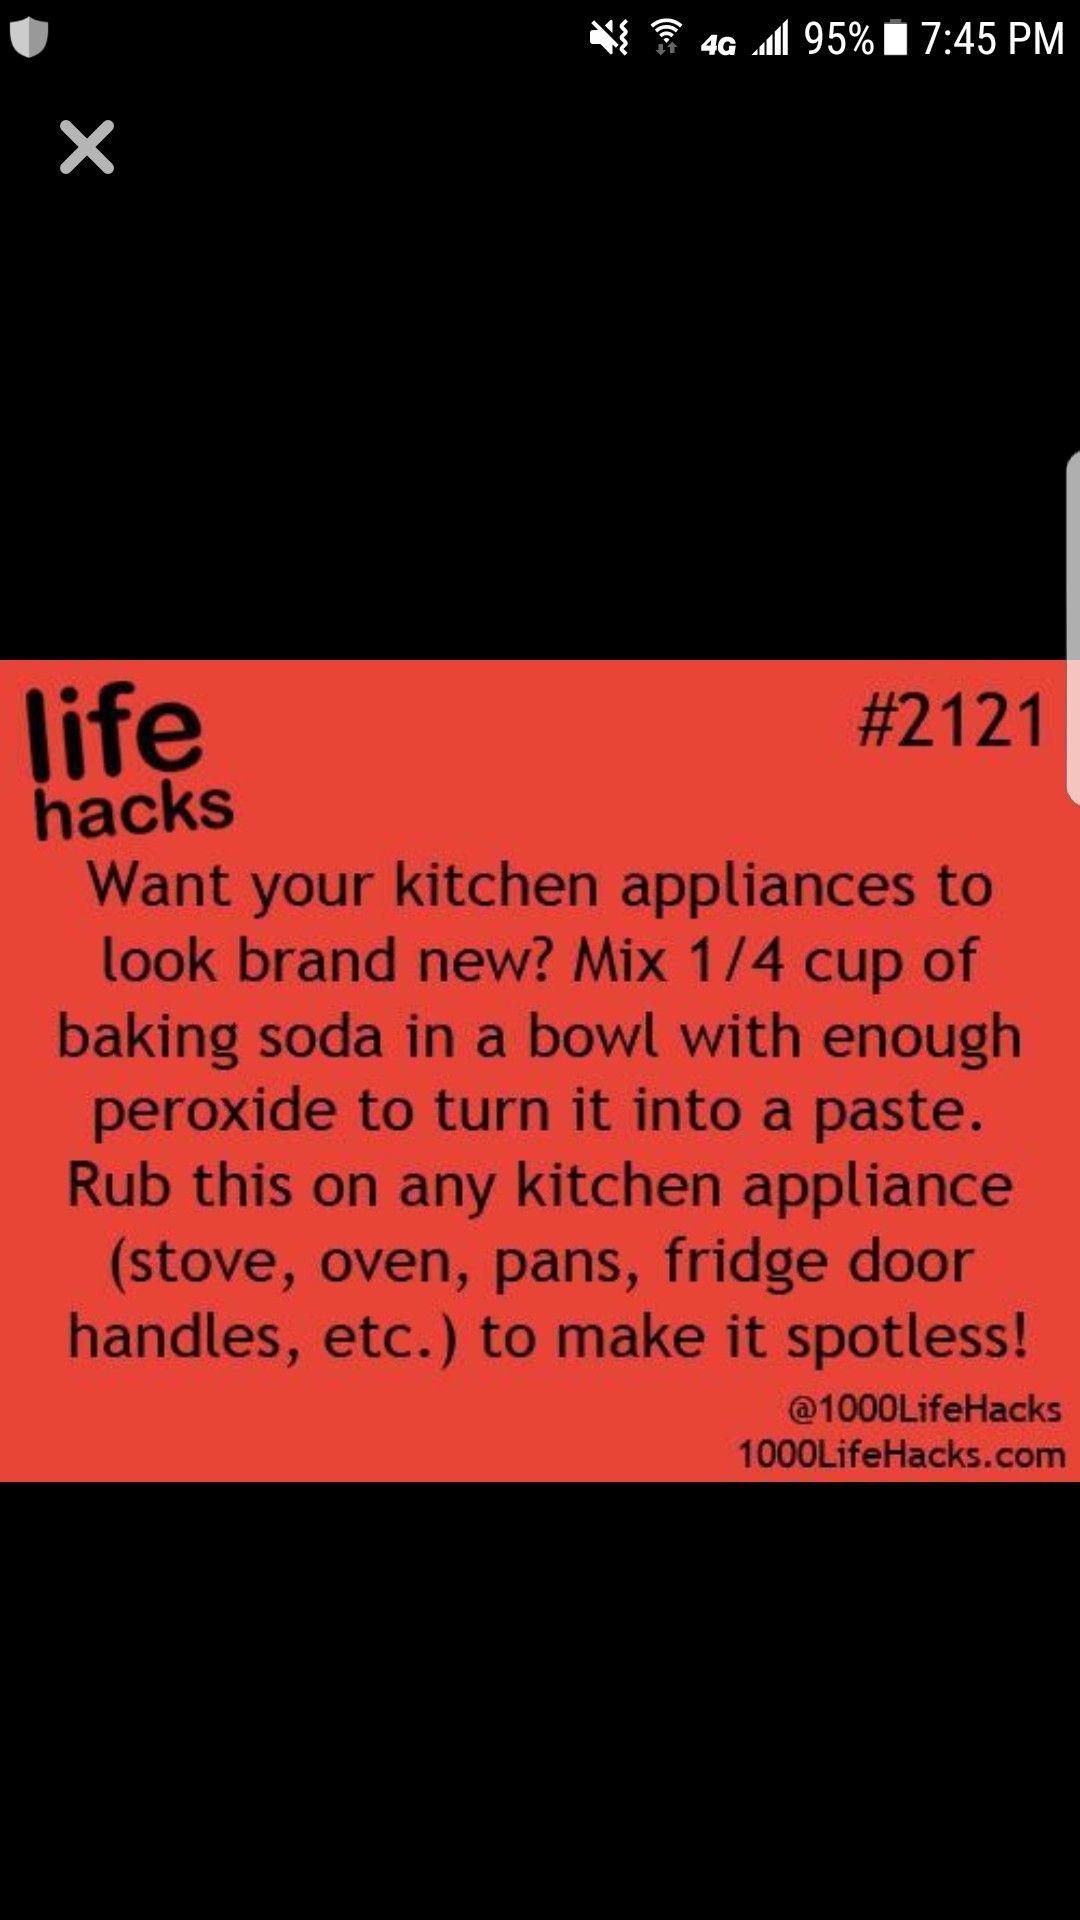 Clean Appliances Spot Less Cleaning Hacks Household Hacks Household Cleaning Tips